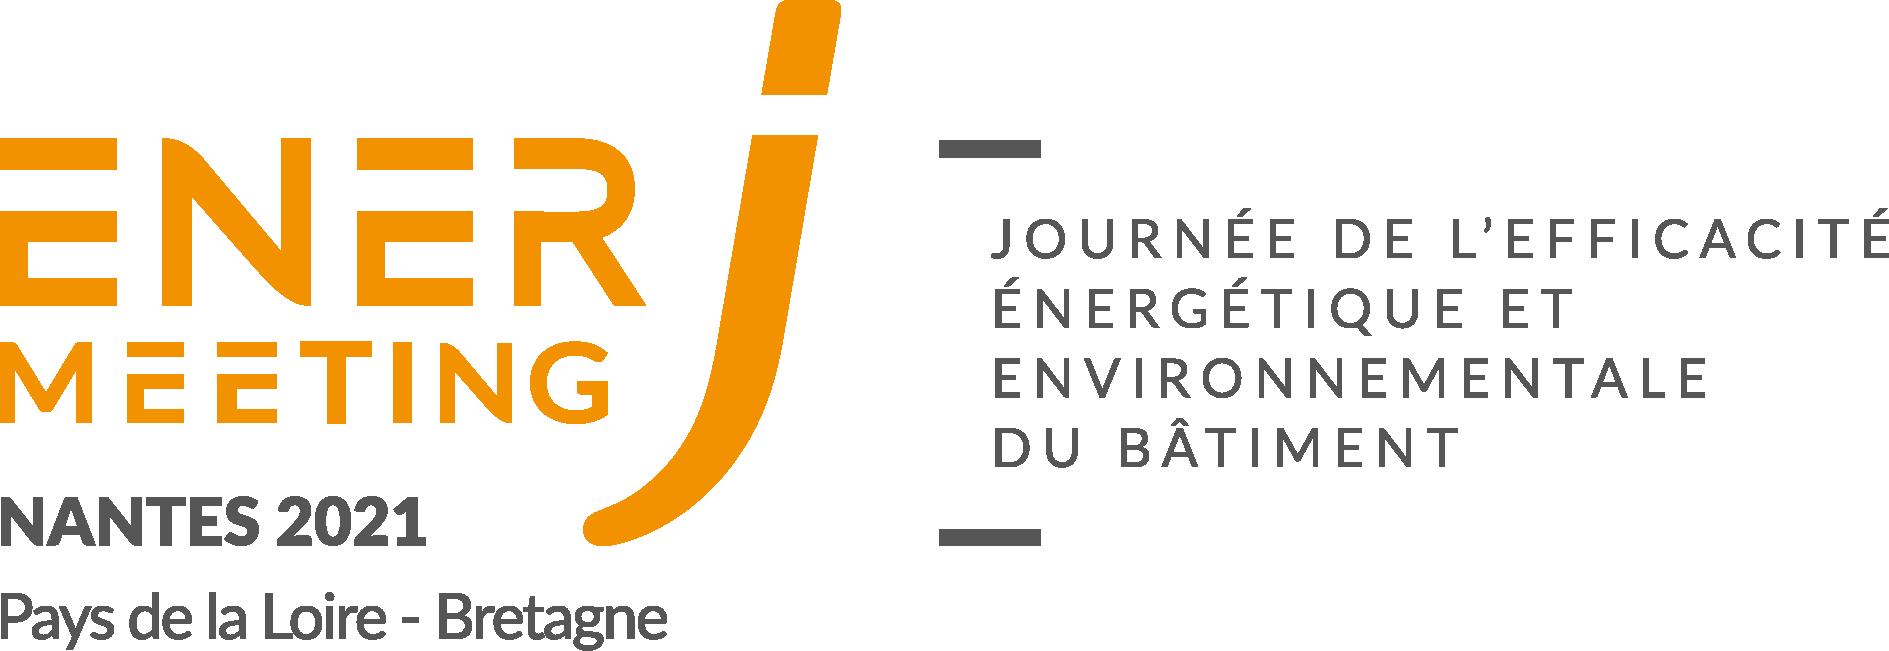 EnerJ-meeting Nantes